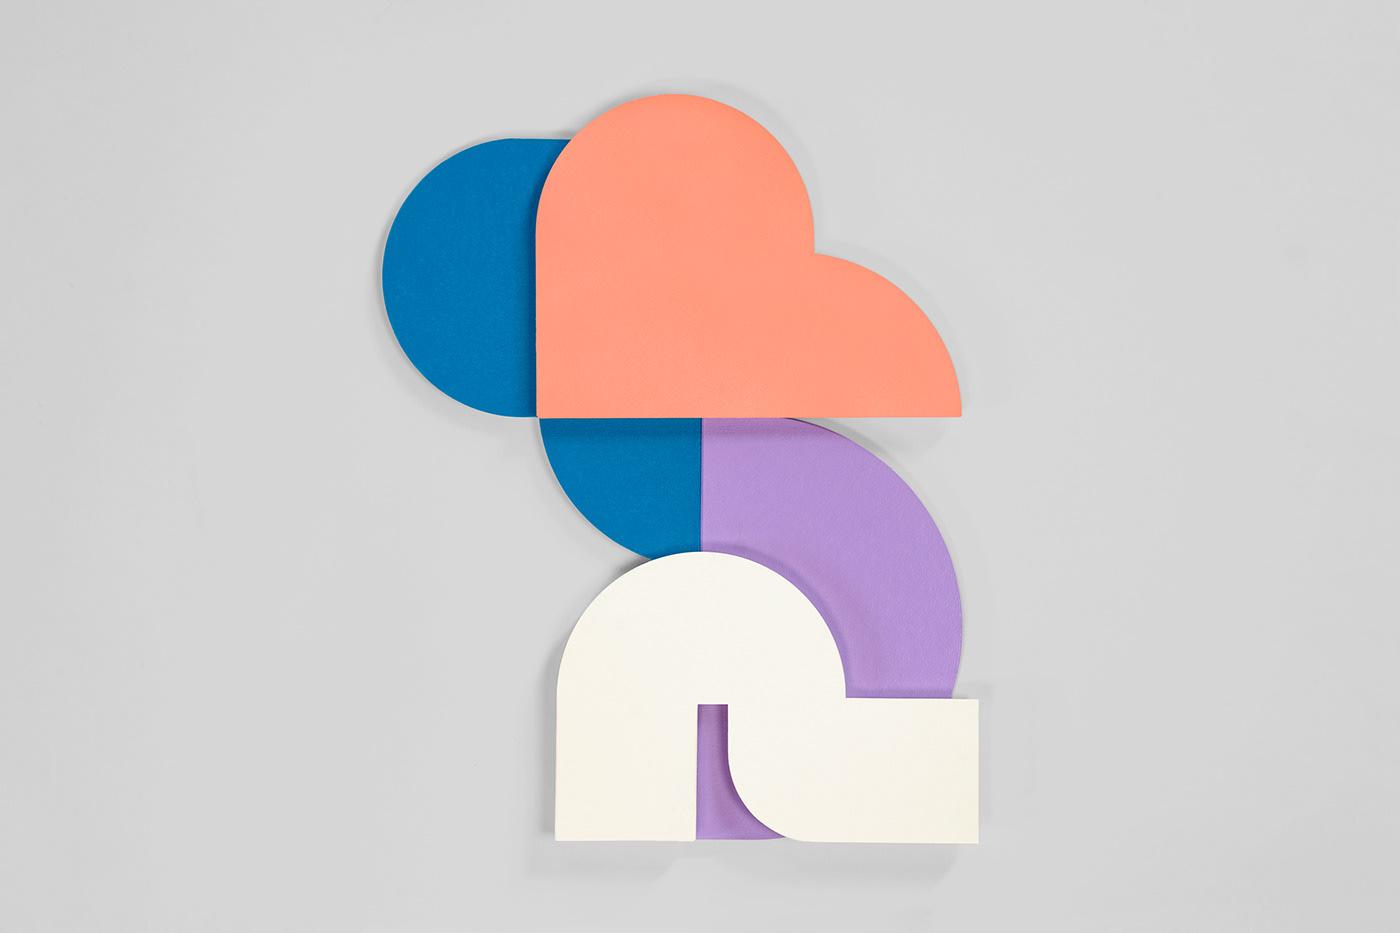 Diseño Corporativo Logos Geométricos